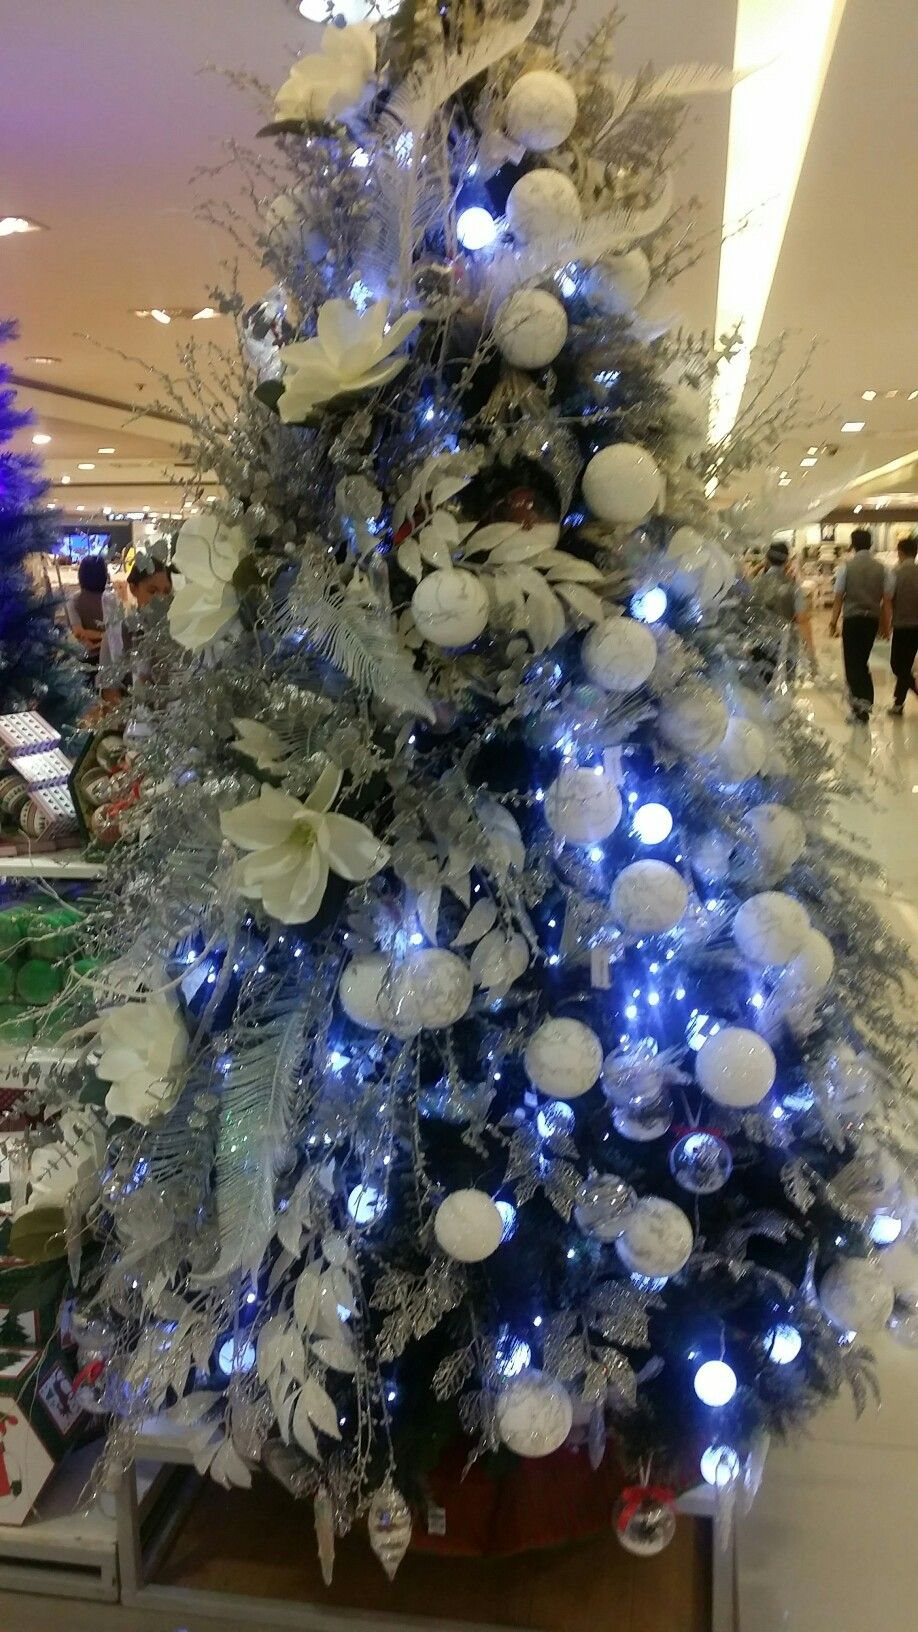 Pin By Flashpackairess On Xmas Manila Tree Design Holiday Decor Tree Designs Christmas Tree